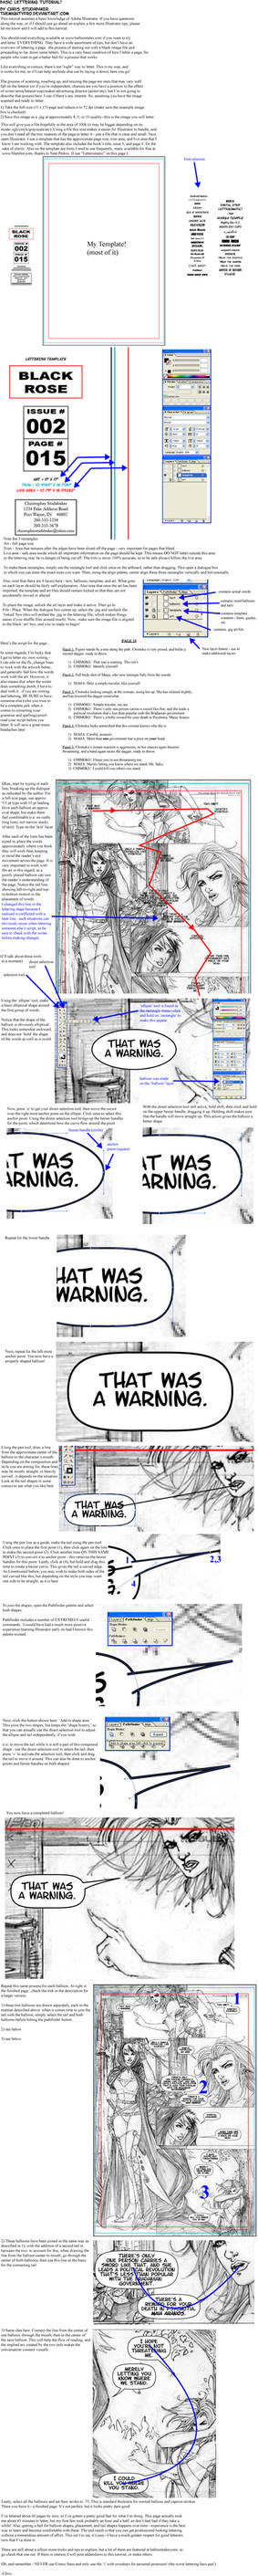 Comics Lettering Tutorial